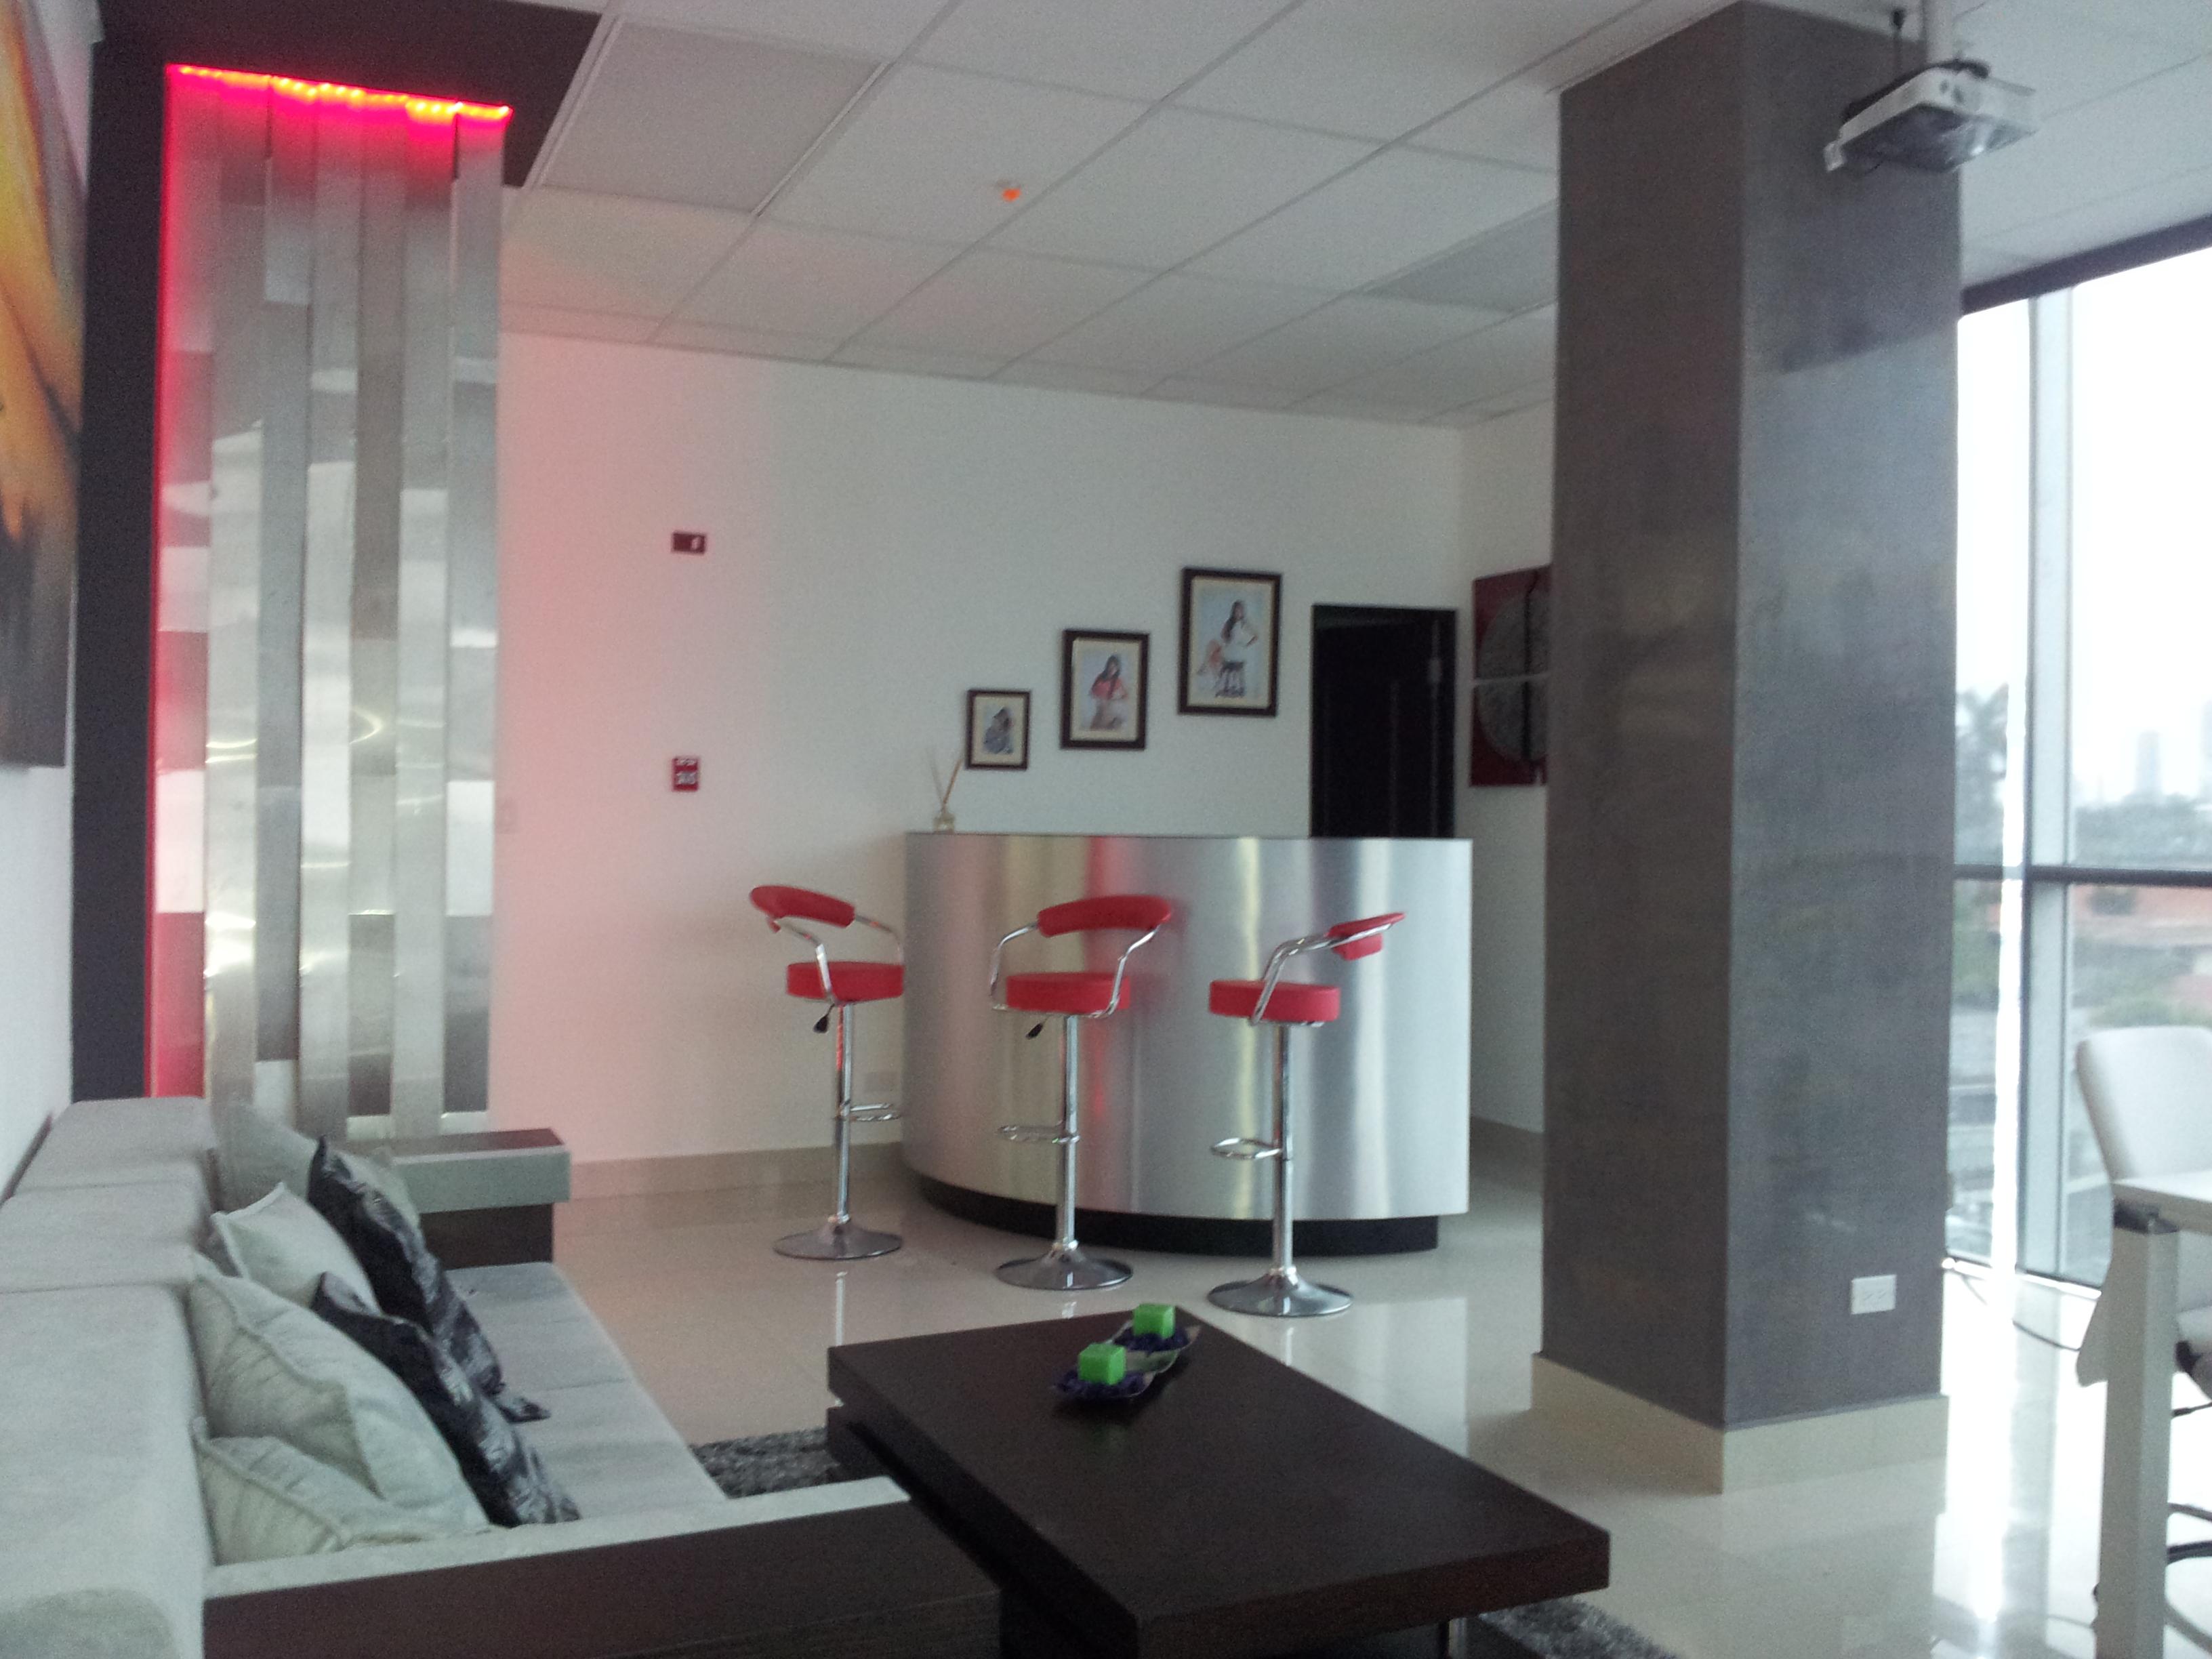 Oficina ejecutiva empresa de aire acondicionado 2011 for Oficina ejecutiva